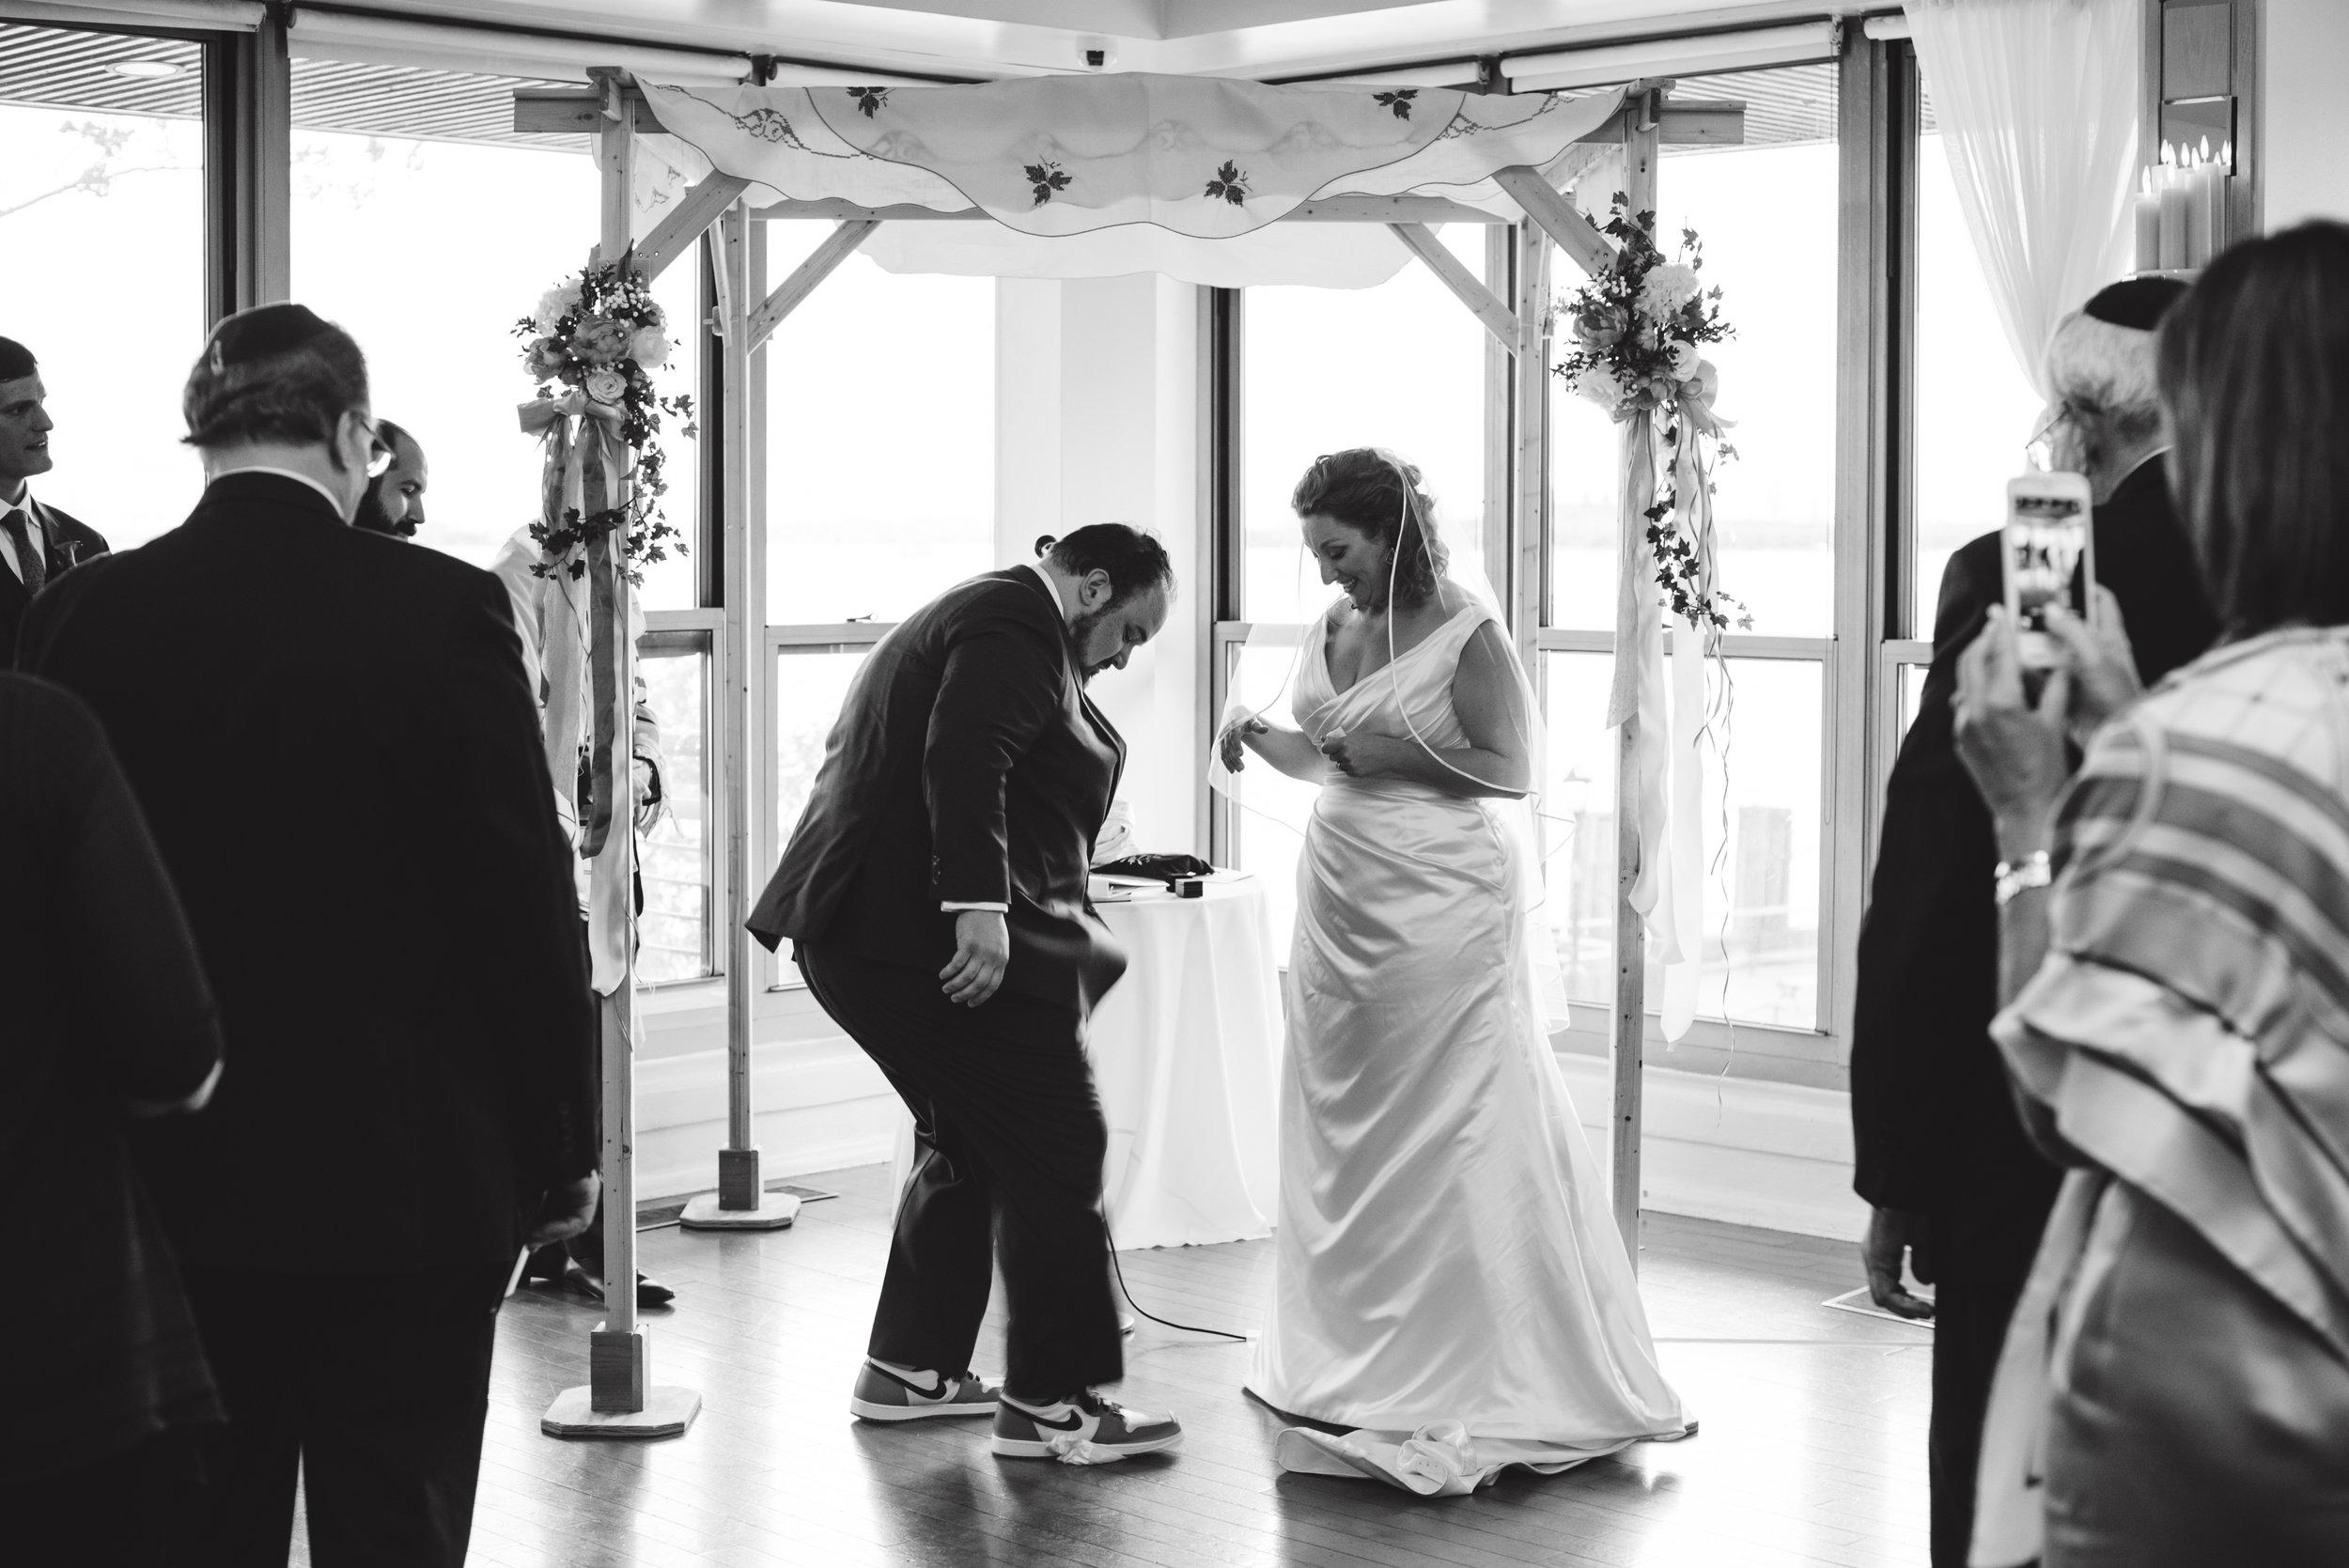 LIZA & JON - BATTERY PARK WEDDING - NYC INTIMATE WEDDING PHOTOGRAPHER - CHI-CHI AGBIM-480.jpg